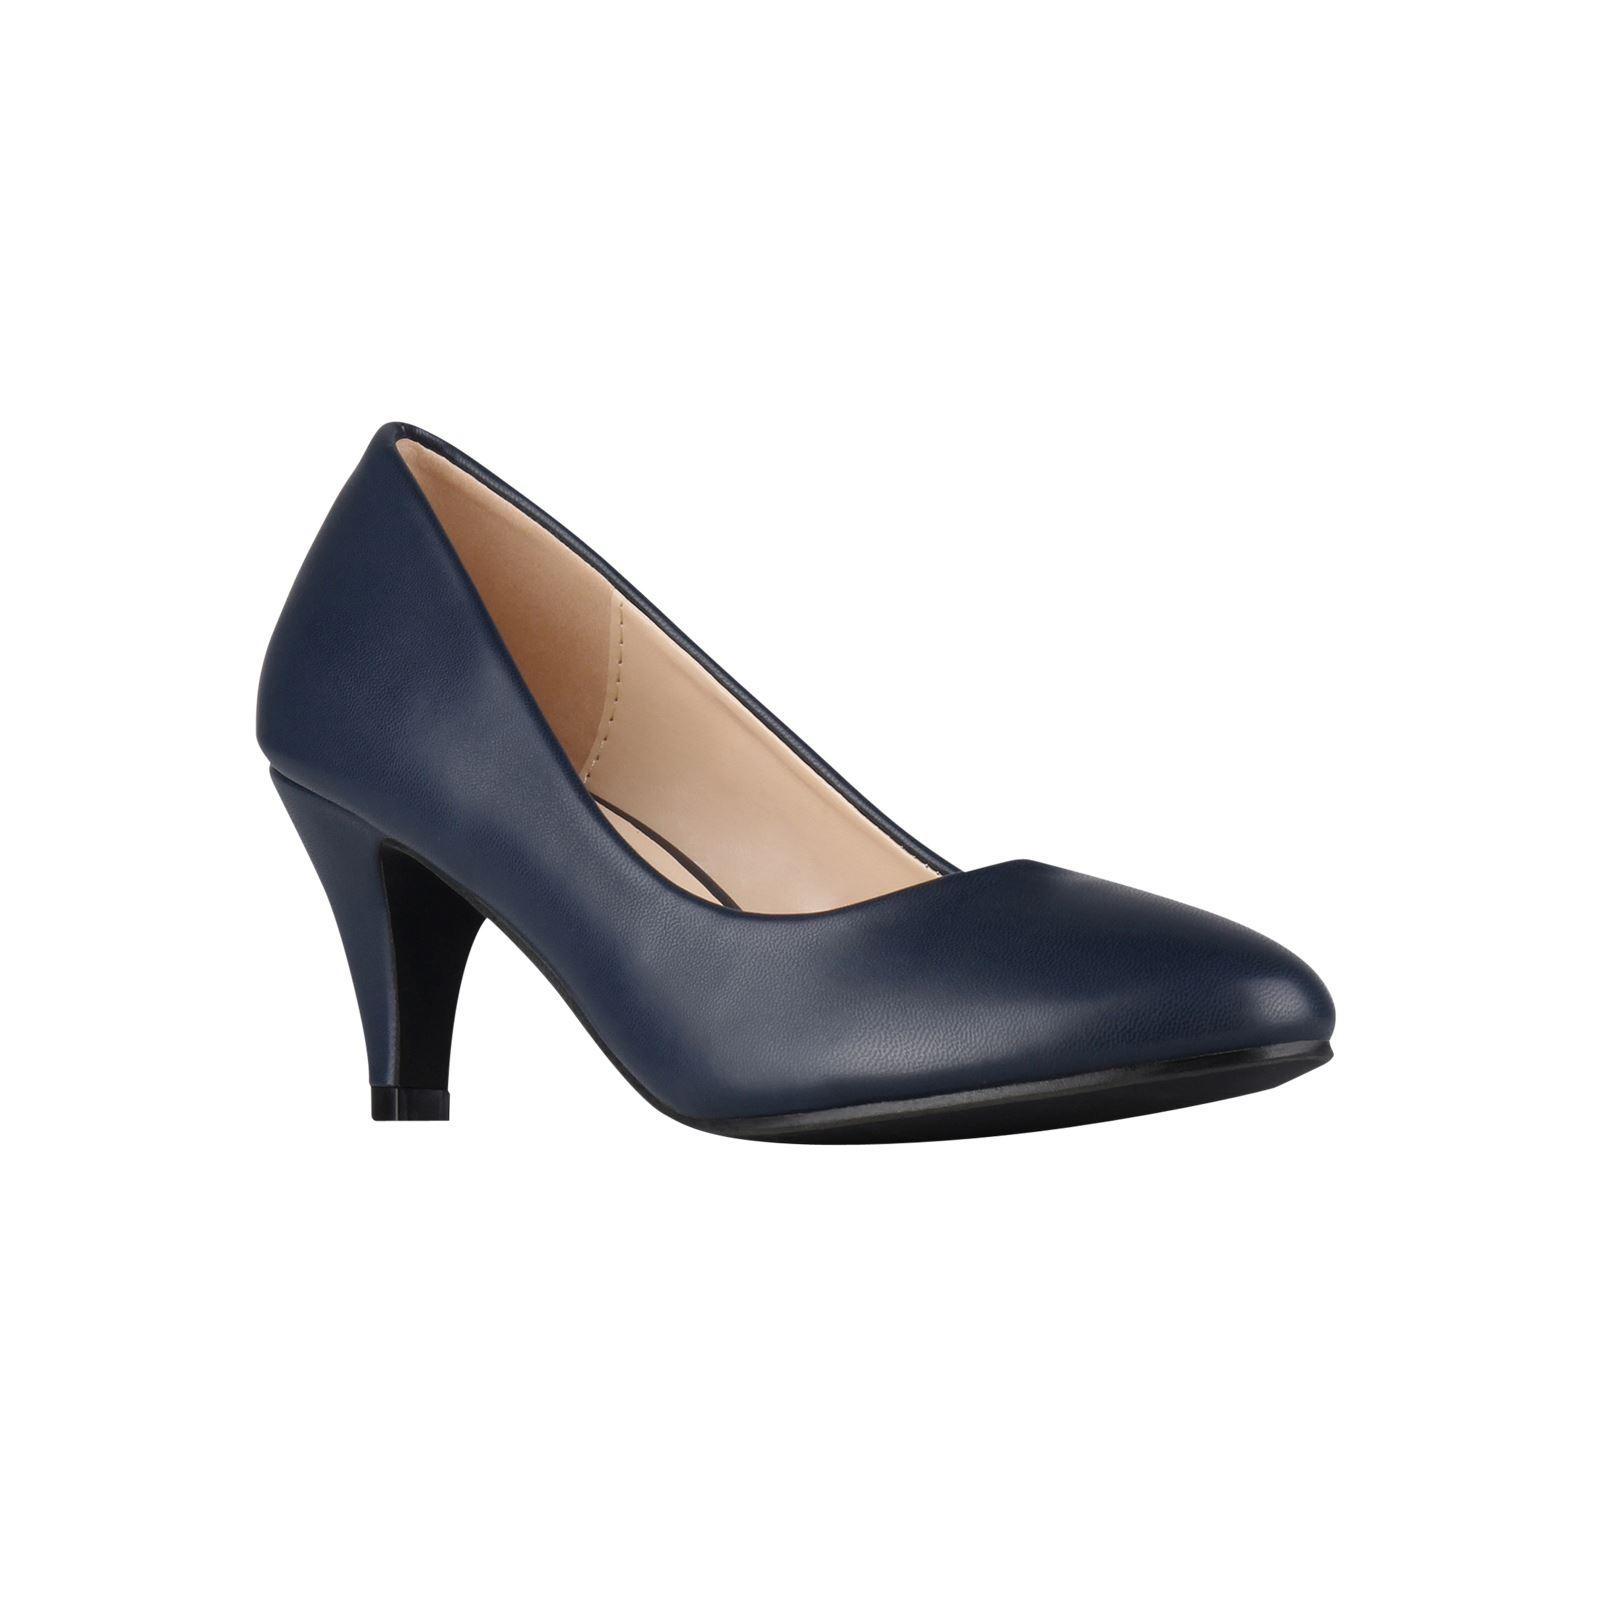 Womens-Ladies-Mid-Heel-Court-Shoes-Slip-On-Low-Kitten-Heels-Pumps-Matte-Size-3-8 thumbnail 13